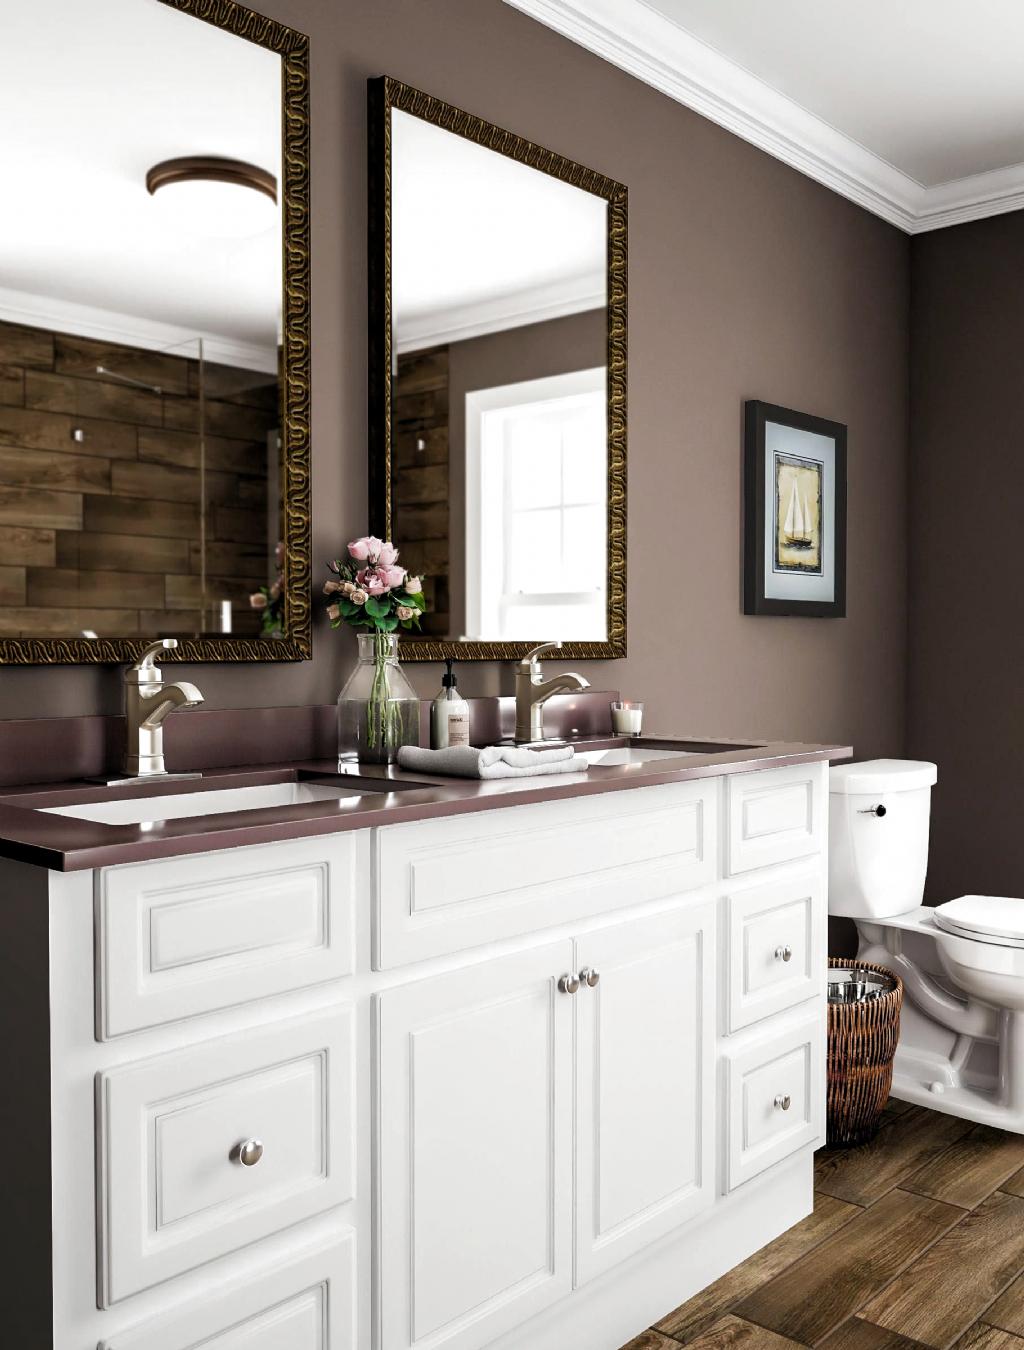 Pin By Kaylyn Clark On Basement Bathroom In 2020 Brown Bathroom Paint Bathroom Paint Colors Bathroom Color Schemes